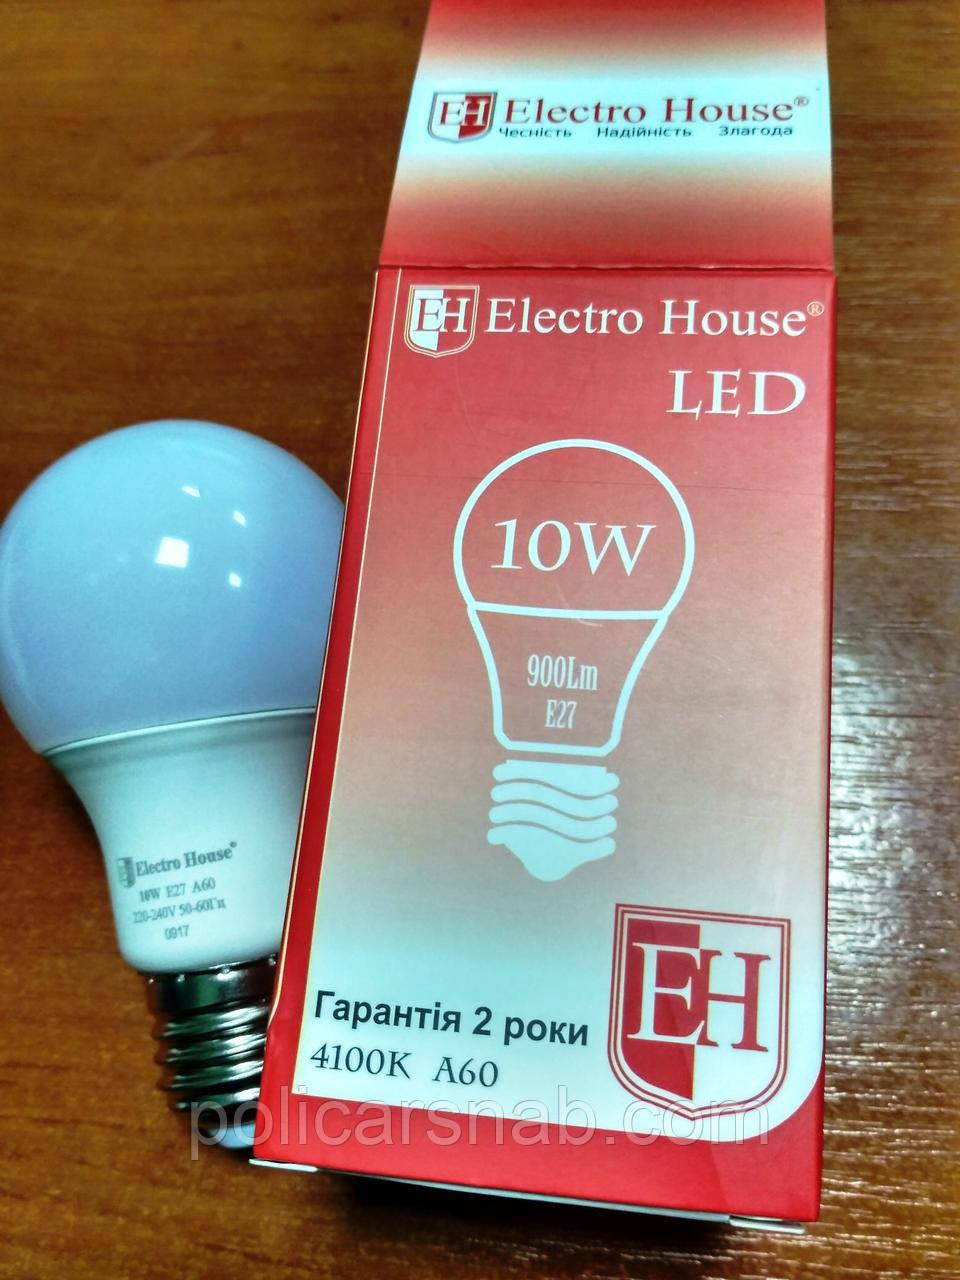 Лампа Electro House светодиодная 10W 900Lm Е27 шар